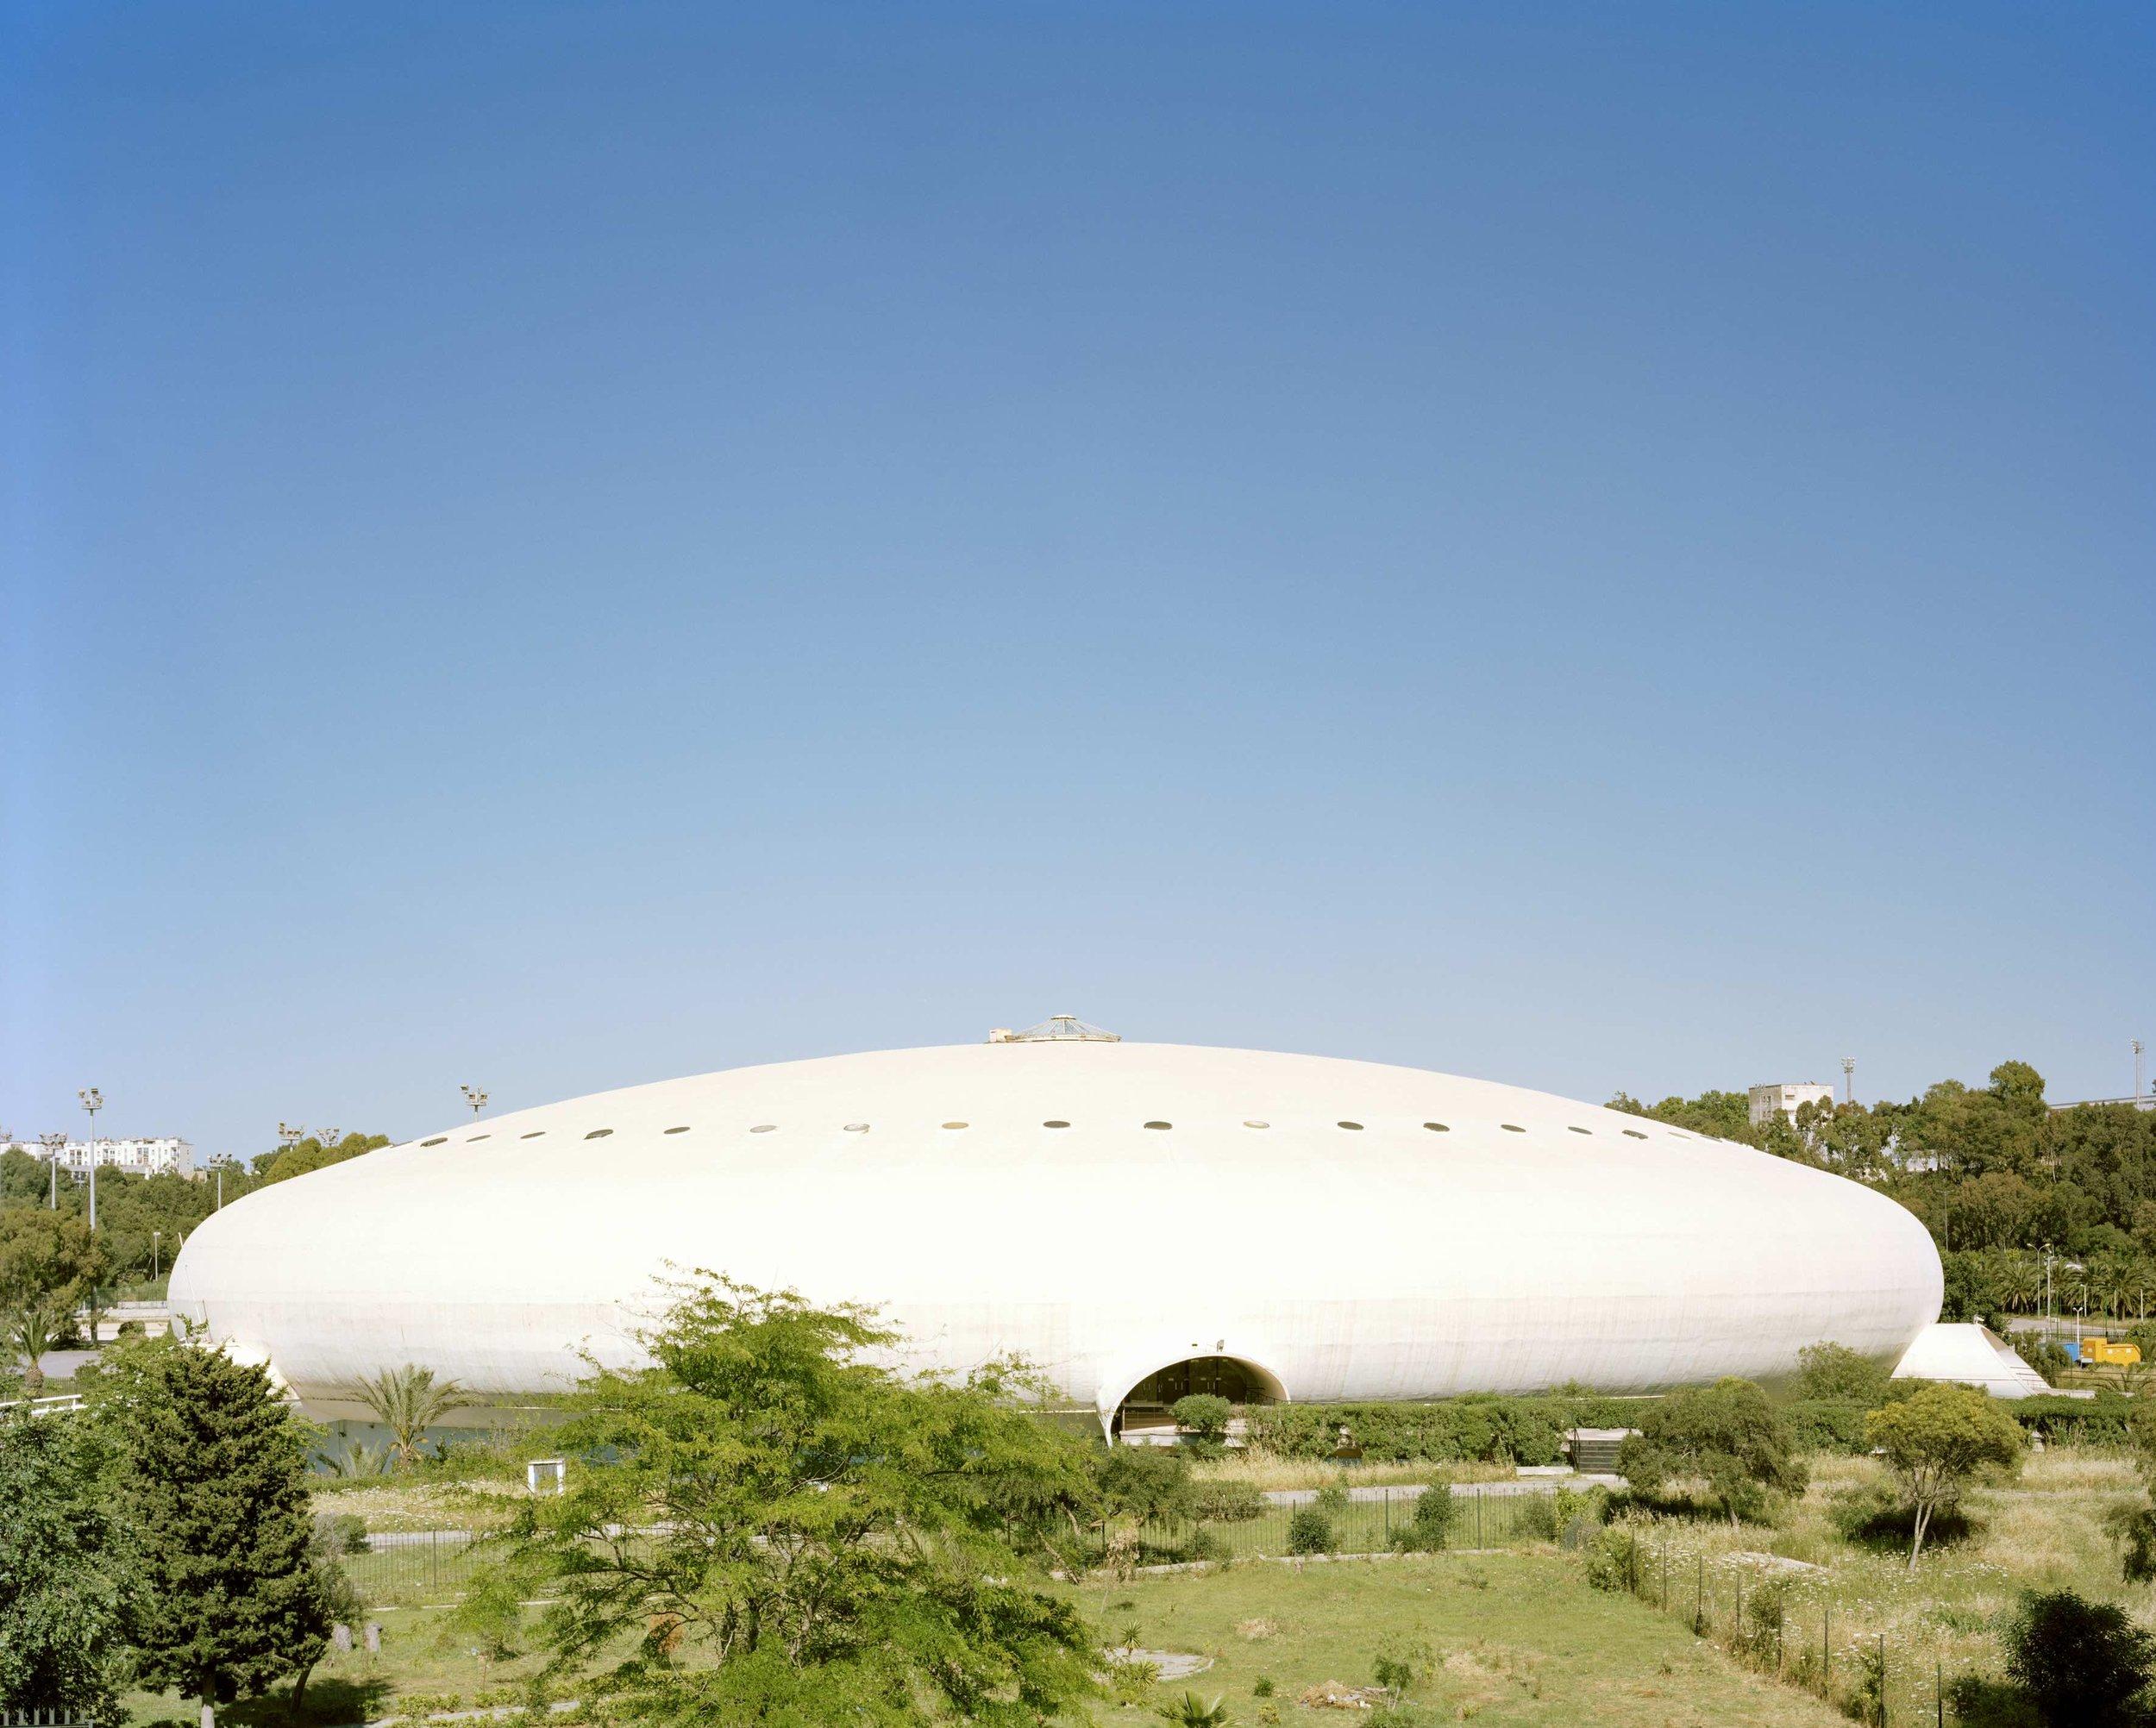 Salle Ominsport, Algiers, Algeria, 2012